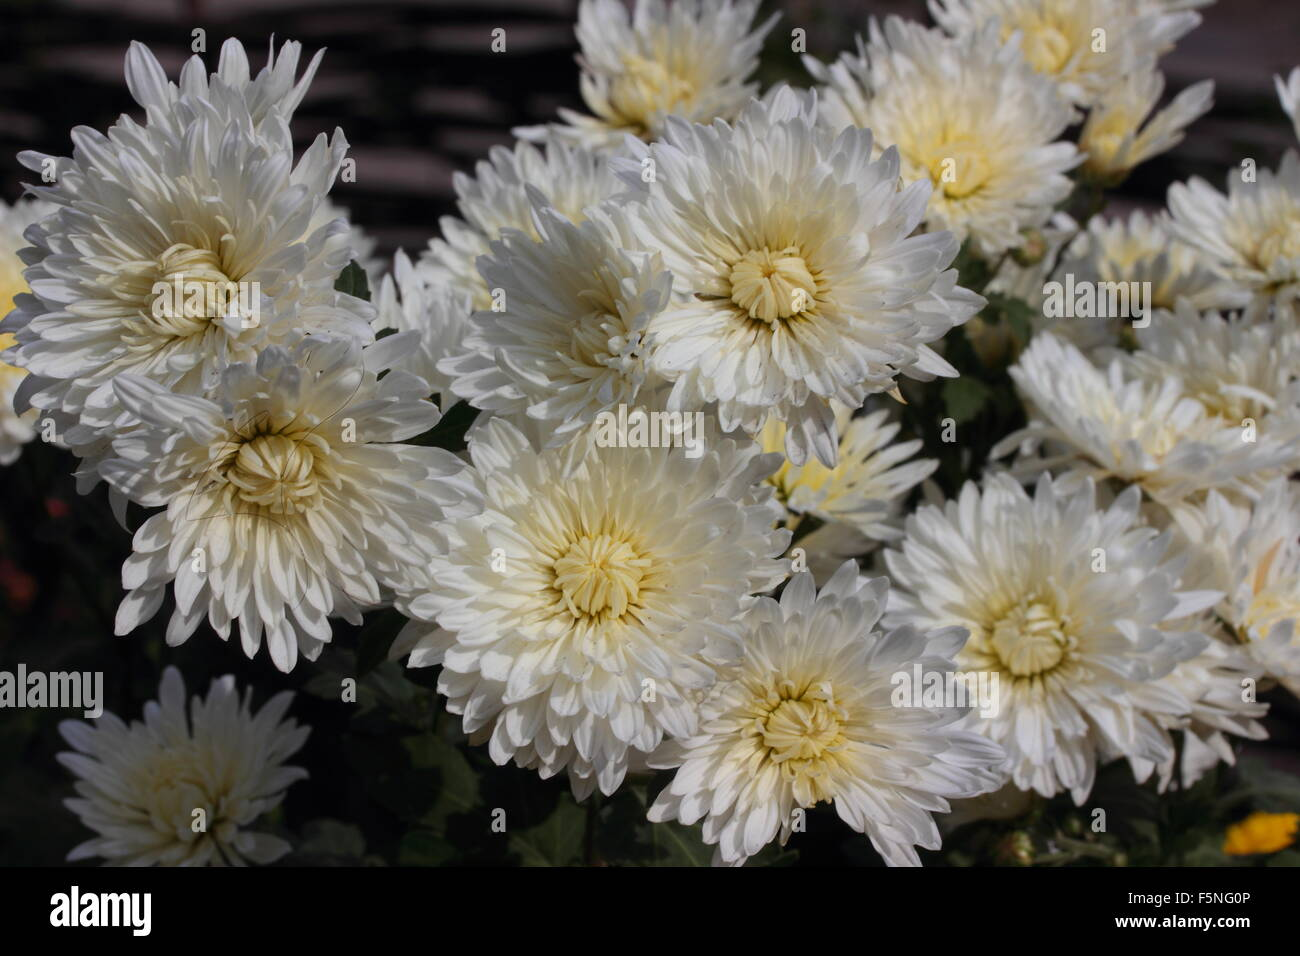 Chrysanthemum White Stock Photos Chrysanthemum White Stock Images